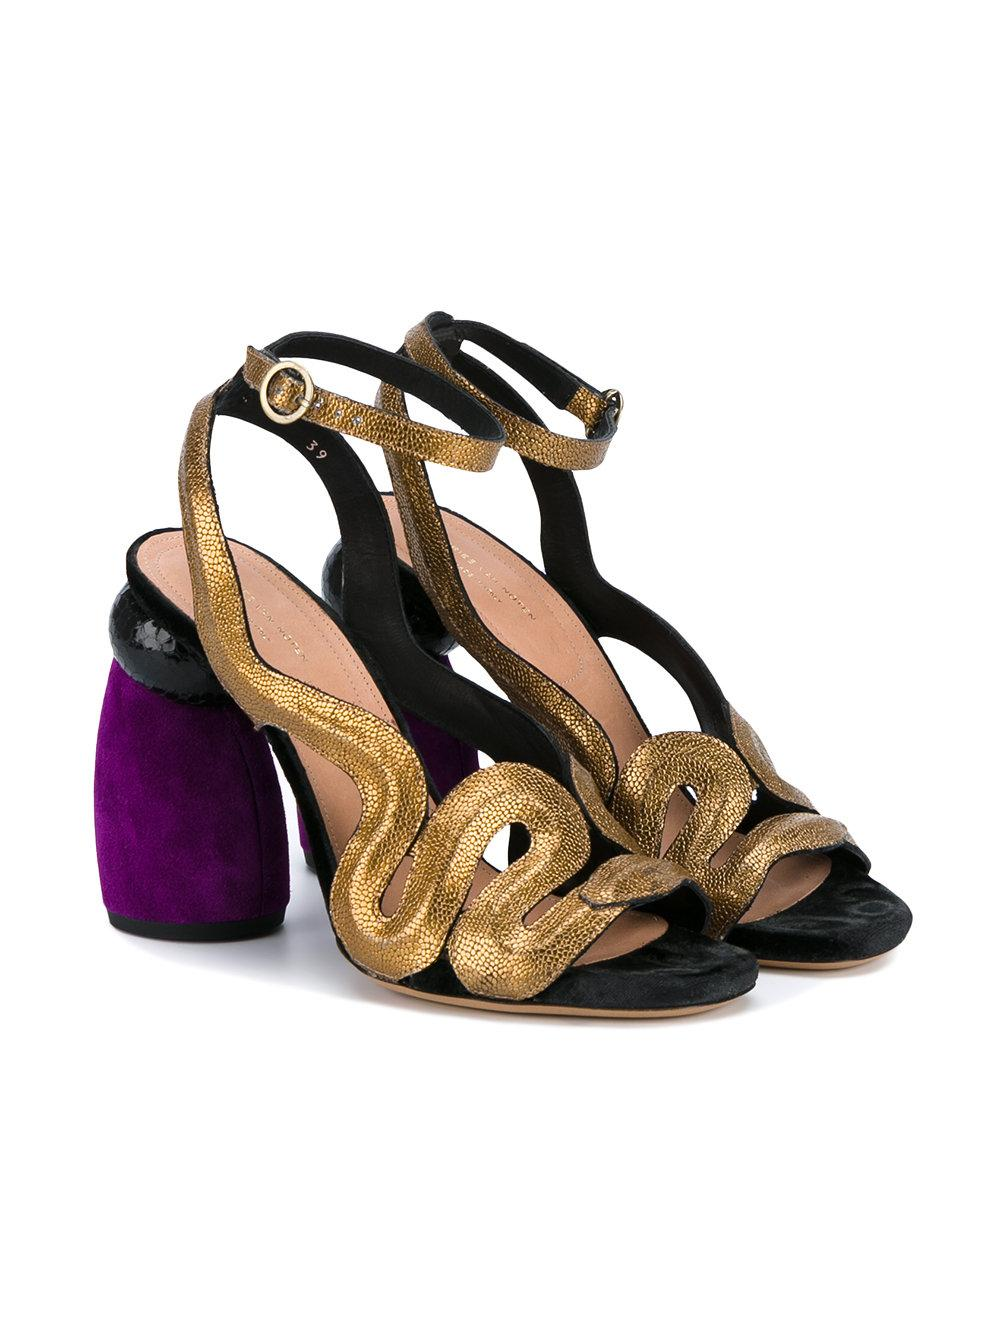 Dansko Shoes Paris